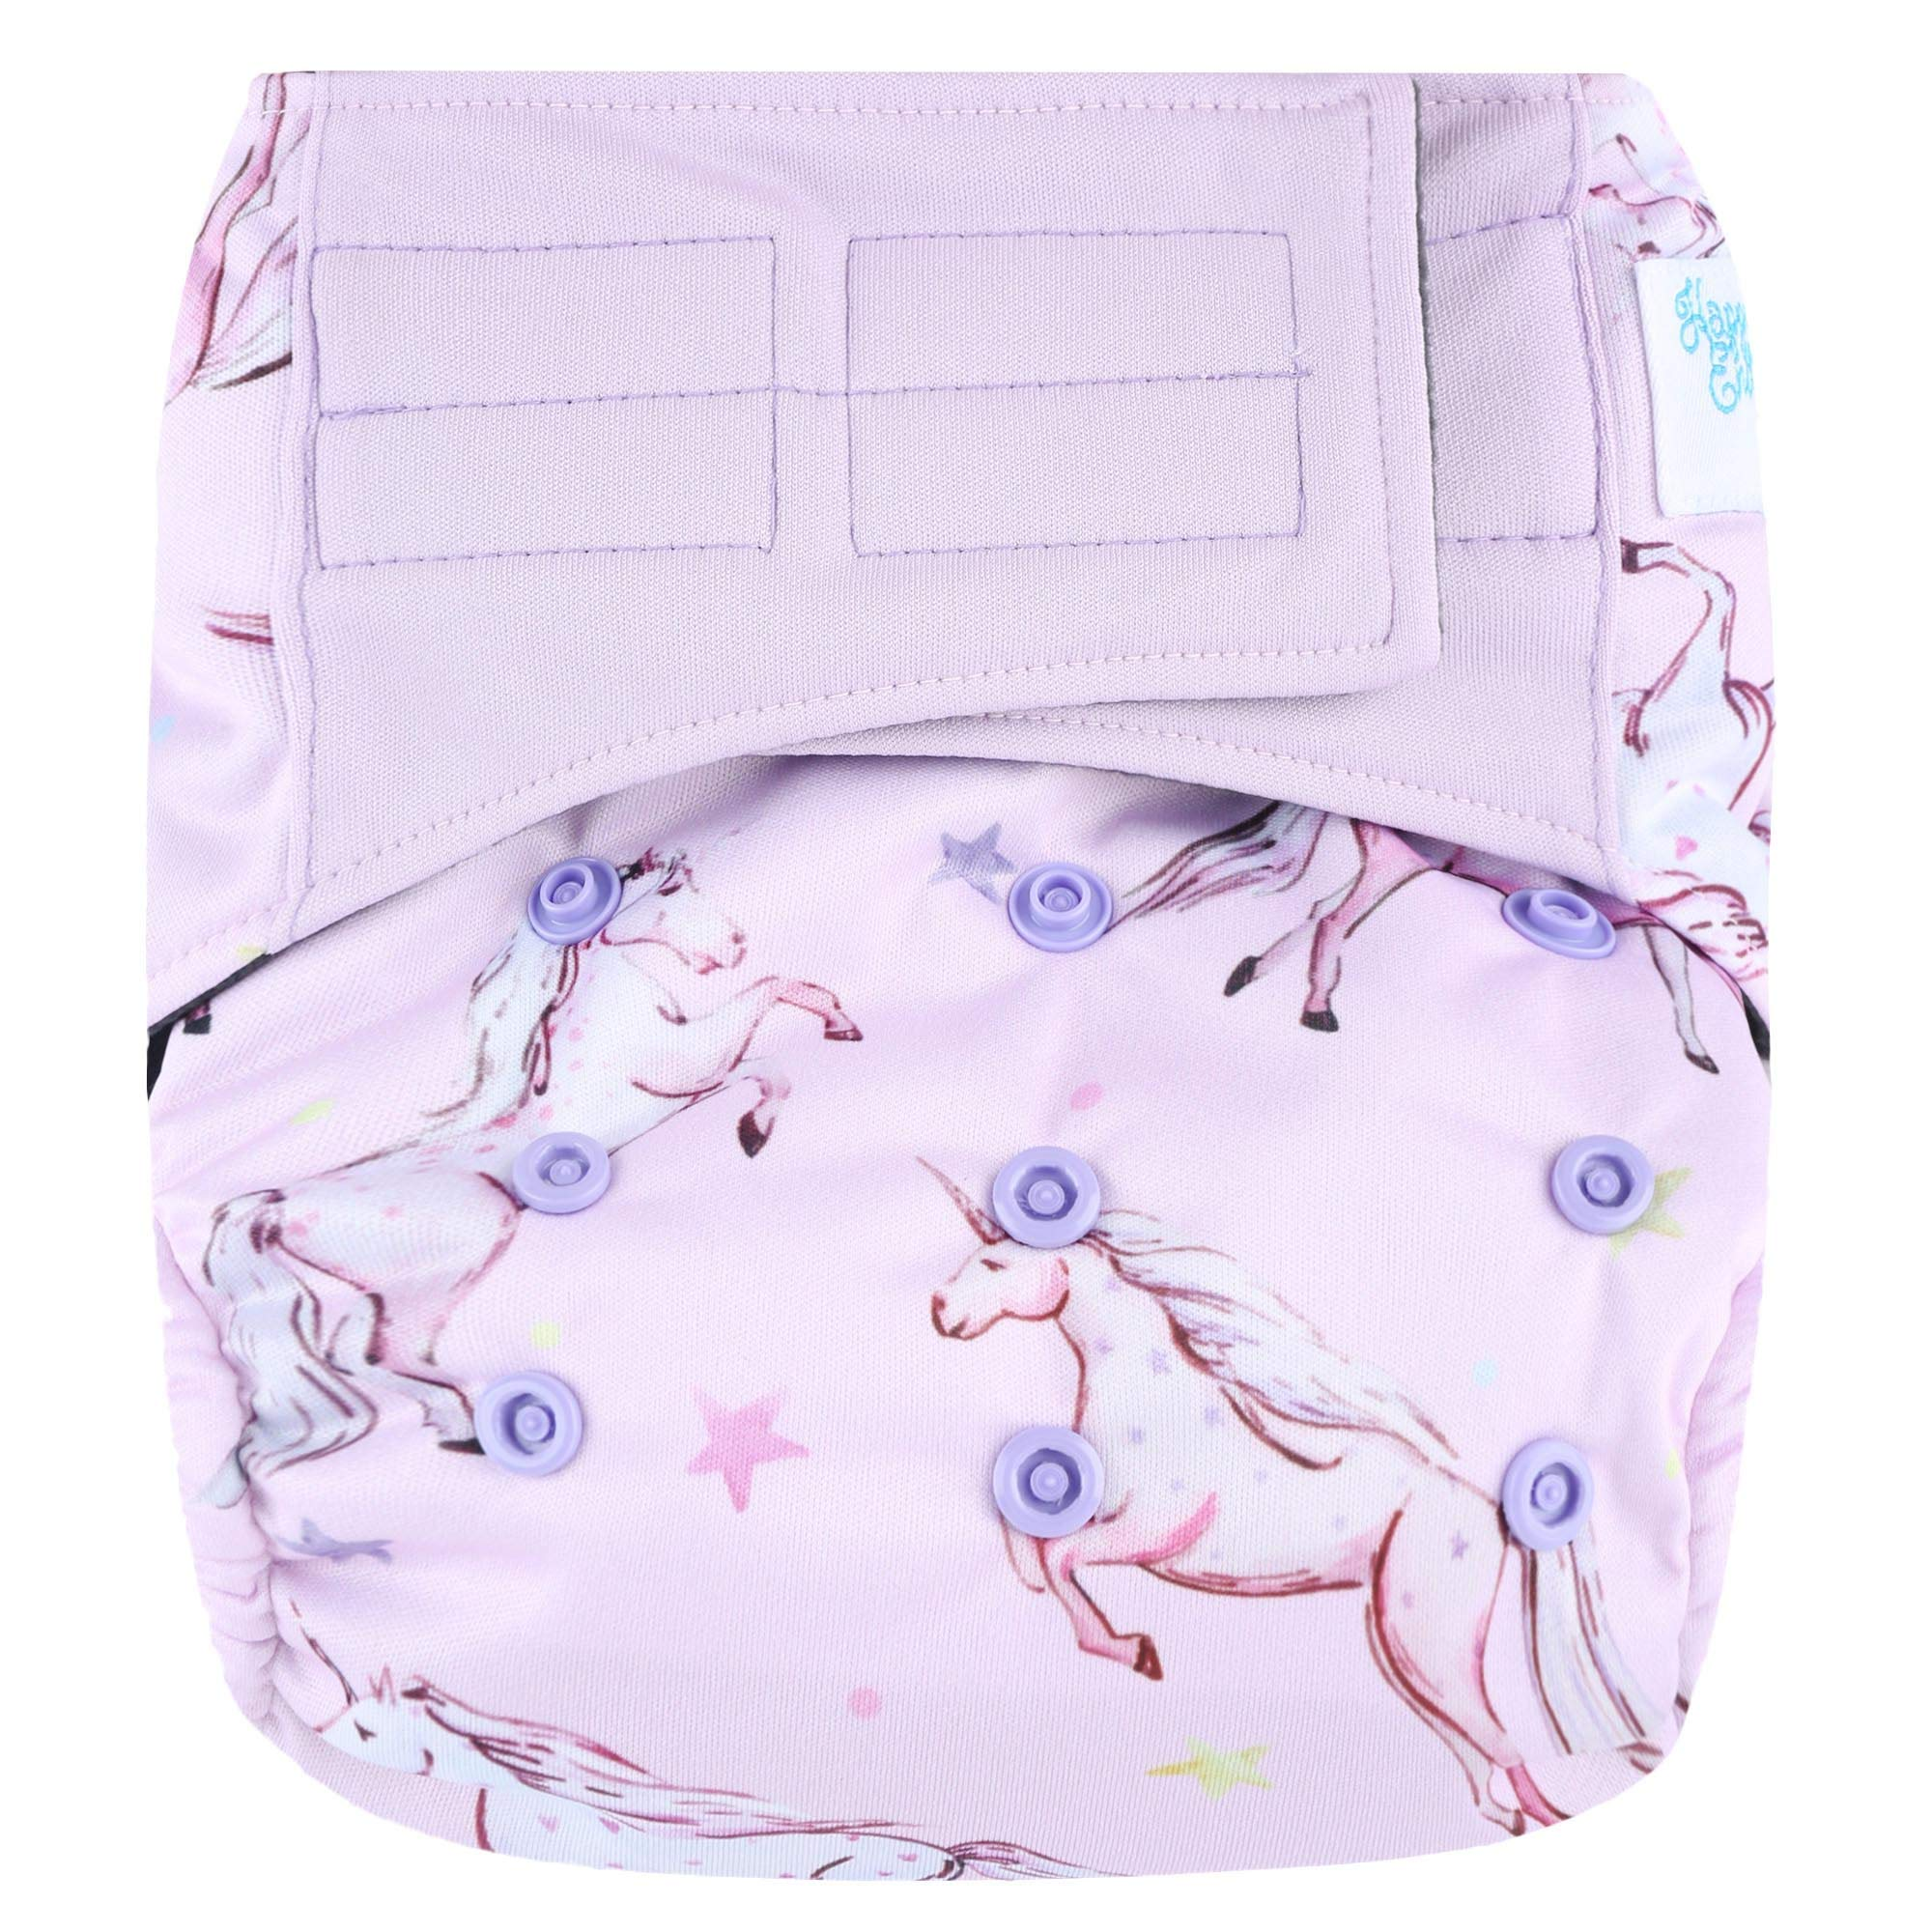 HappyEndings Contoured Diaper Pocket Unicorns